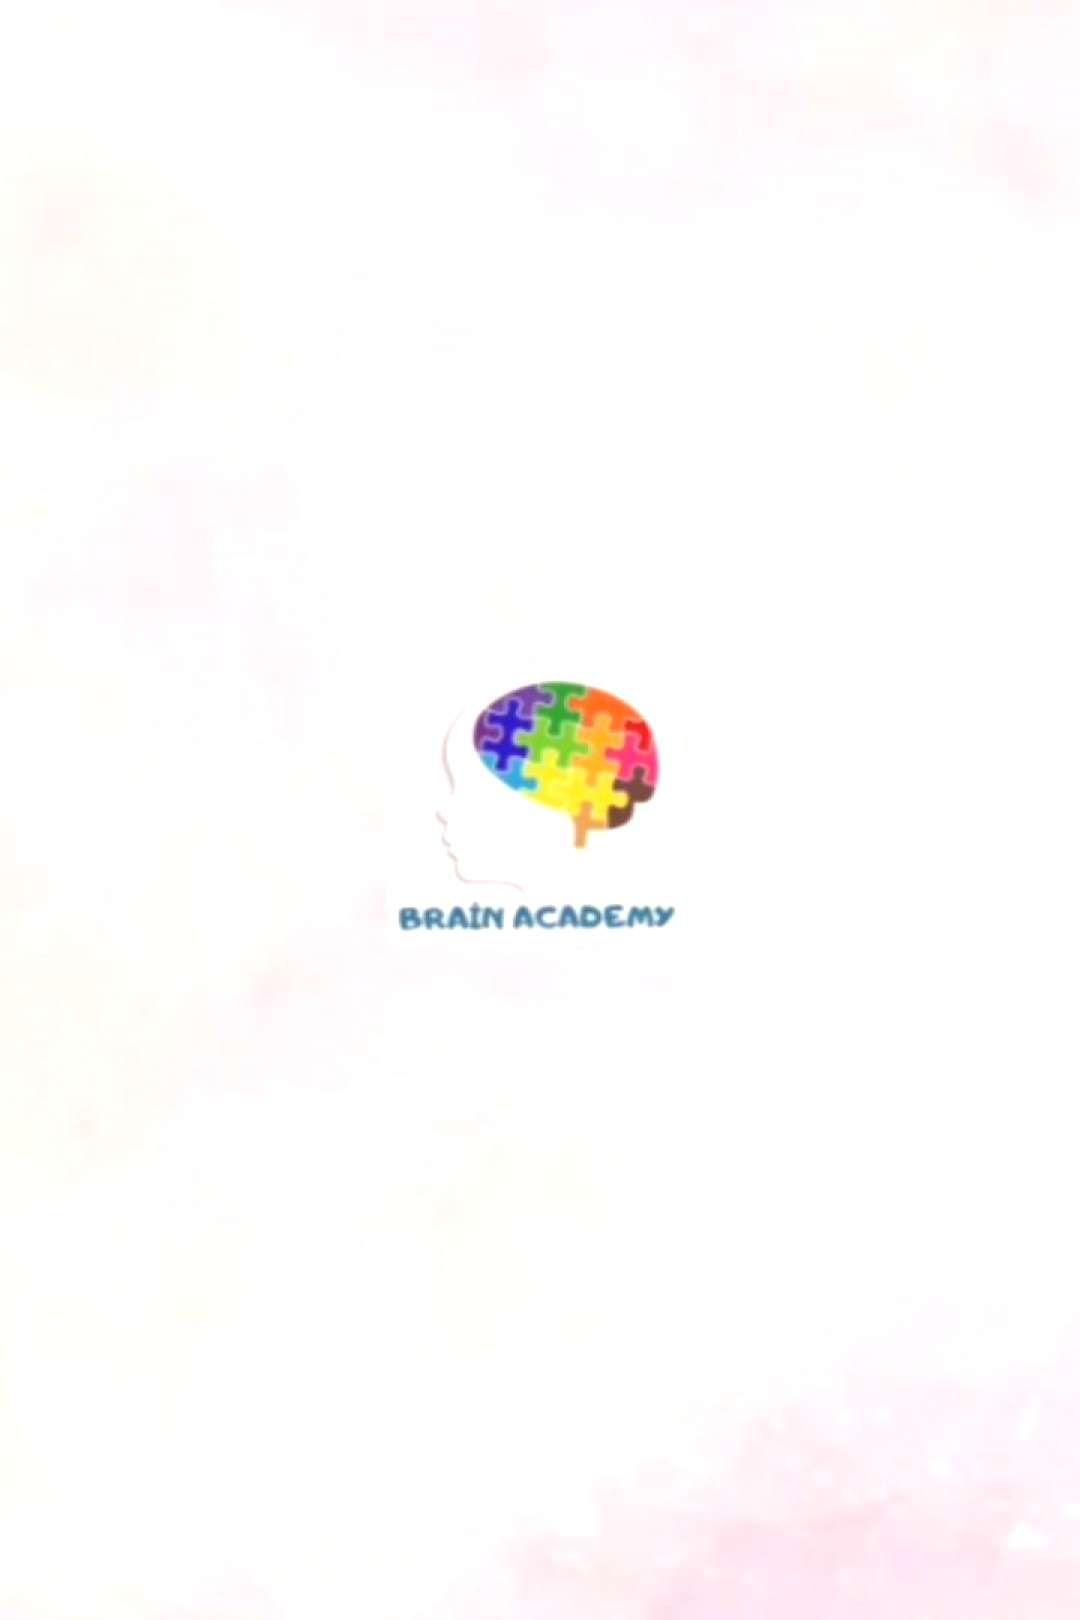 #brainacademykidsgame #montessori #kidsworld #instablog #activity #inte brainacademykidsgame kidsworld instablog montessori activity inteYou can find Kidsworld and more on our website.brainacademykidsgame kidsworld instablog montessori activity...